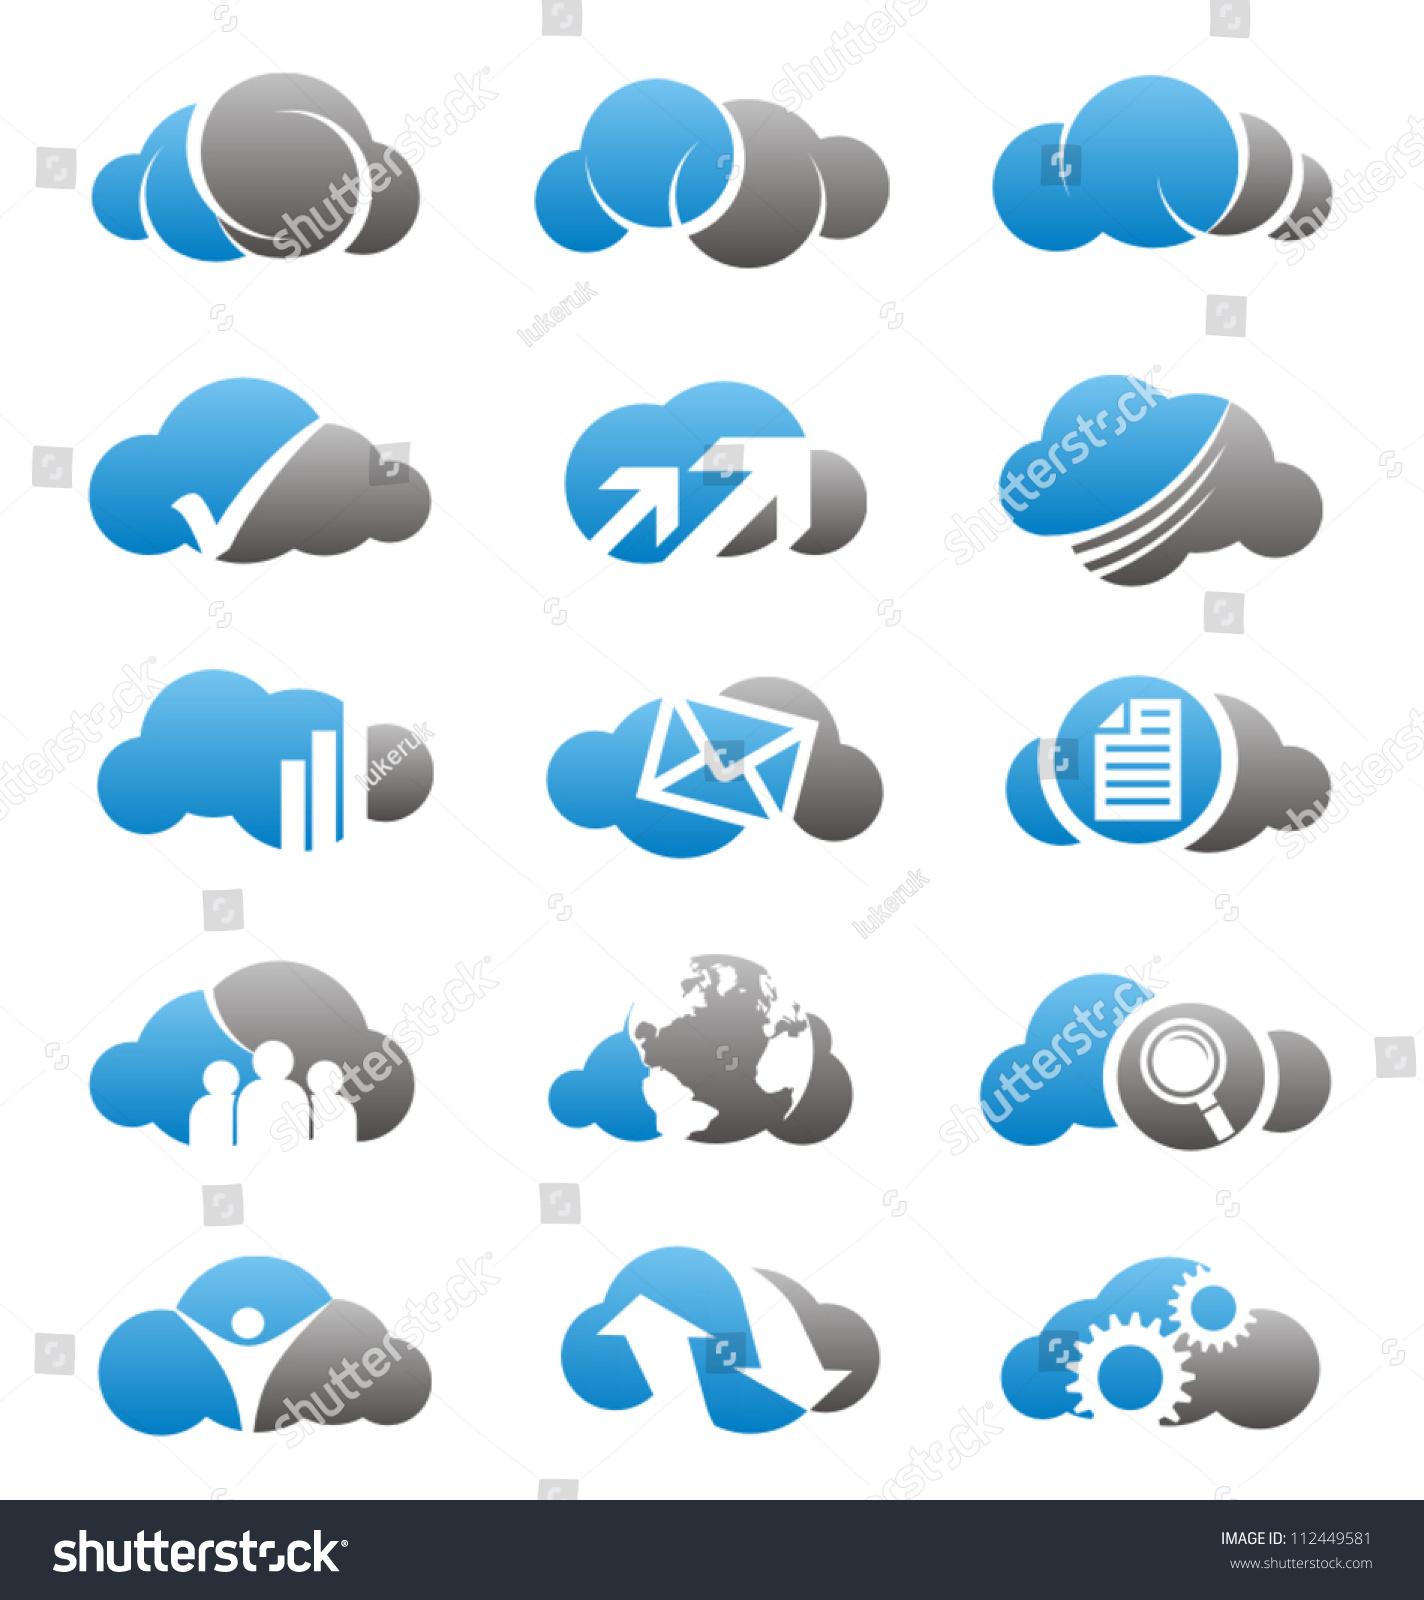 Royal selangor it system and cloud computing